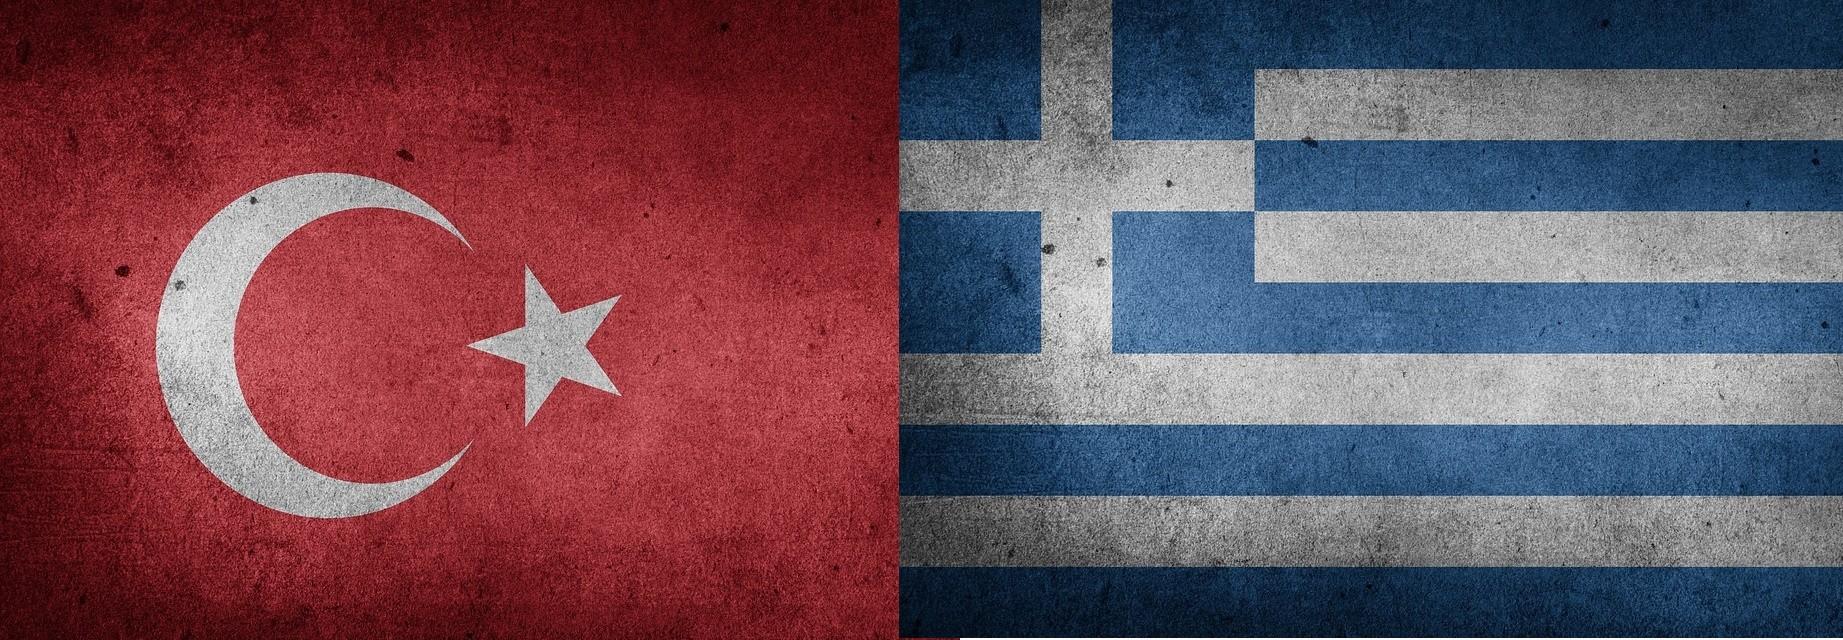 grecja turcja